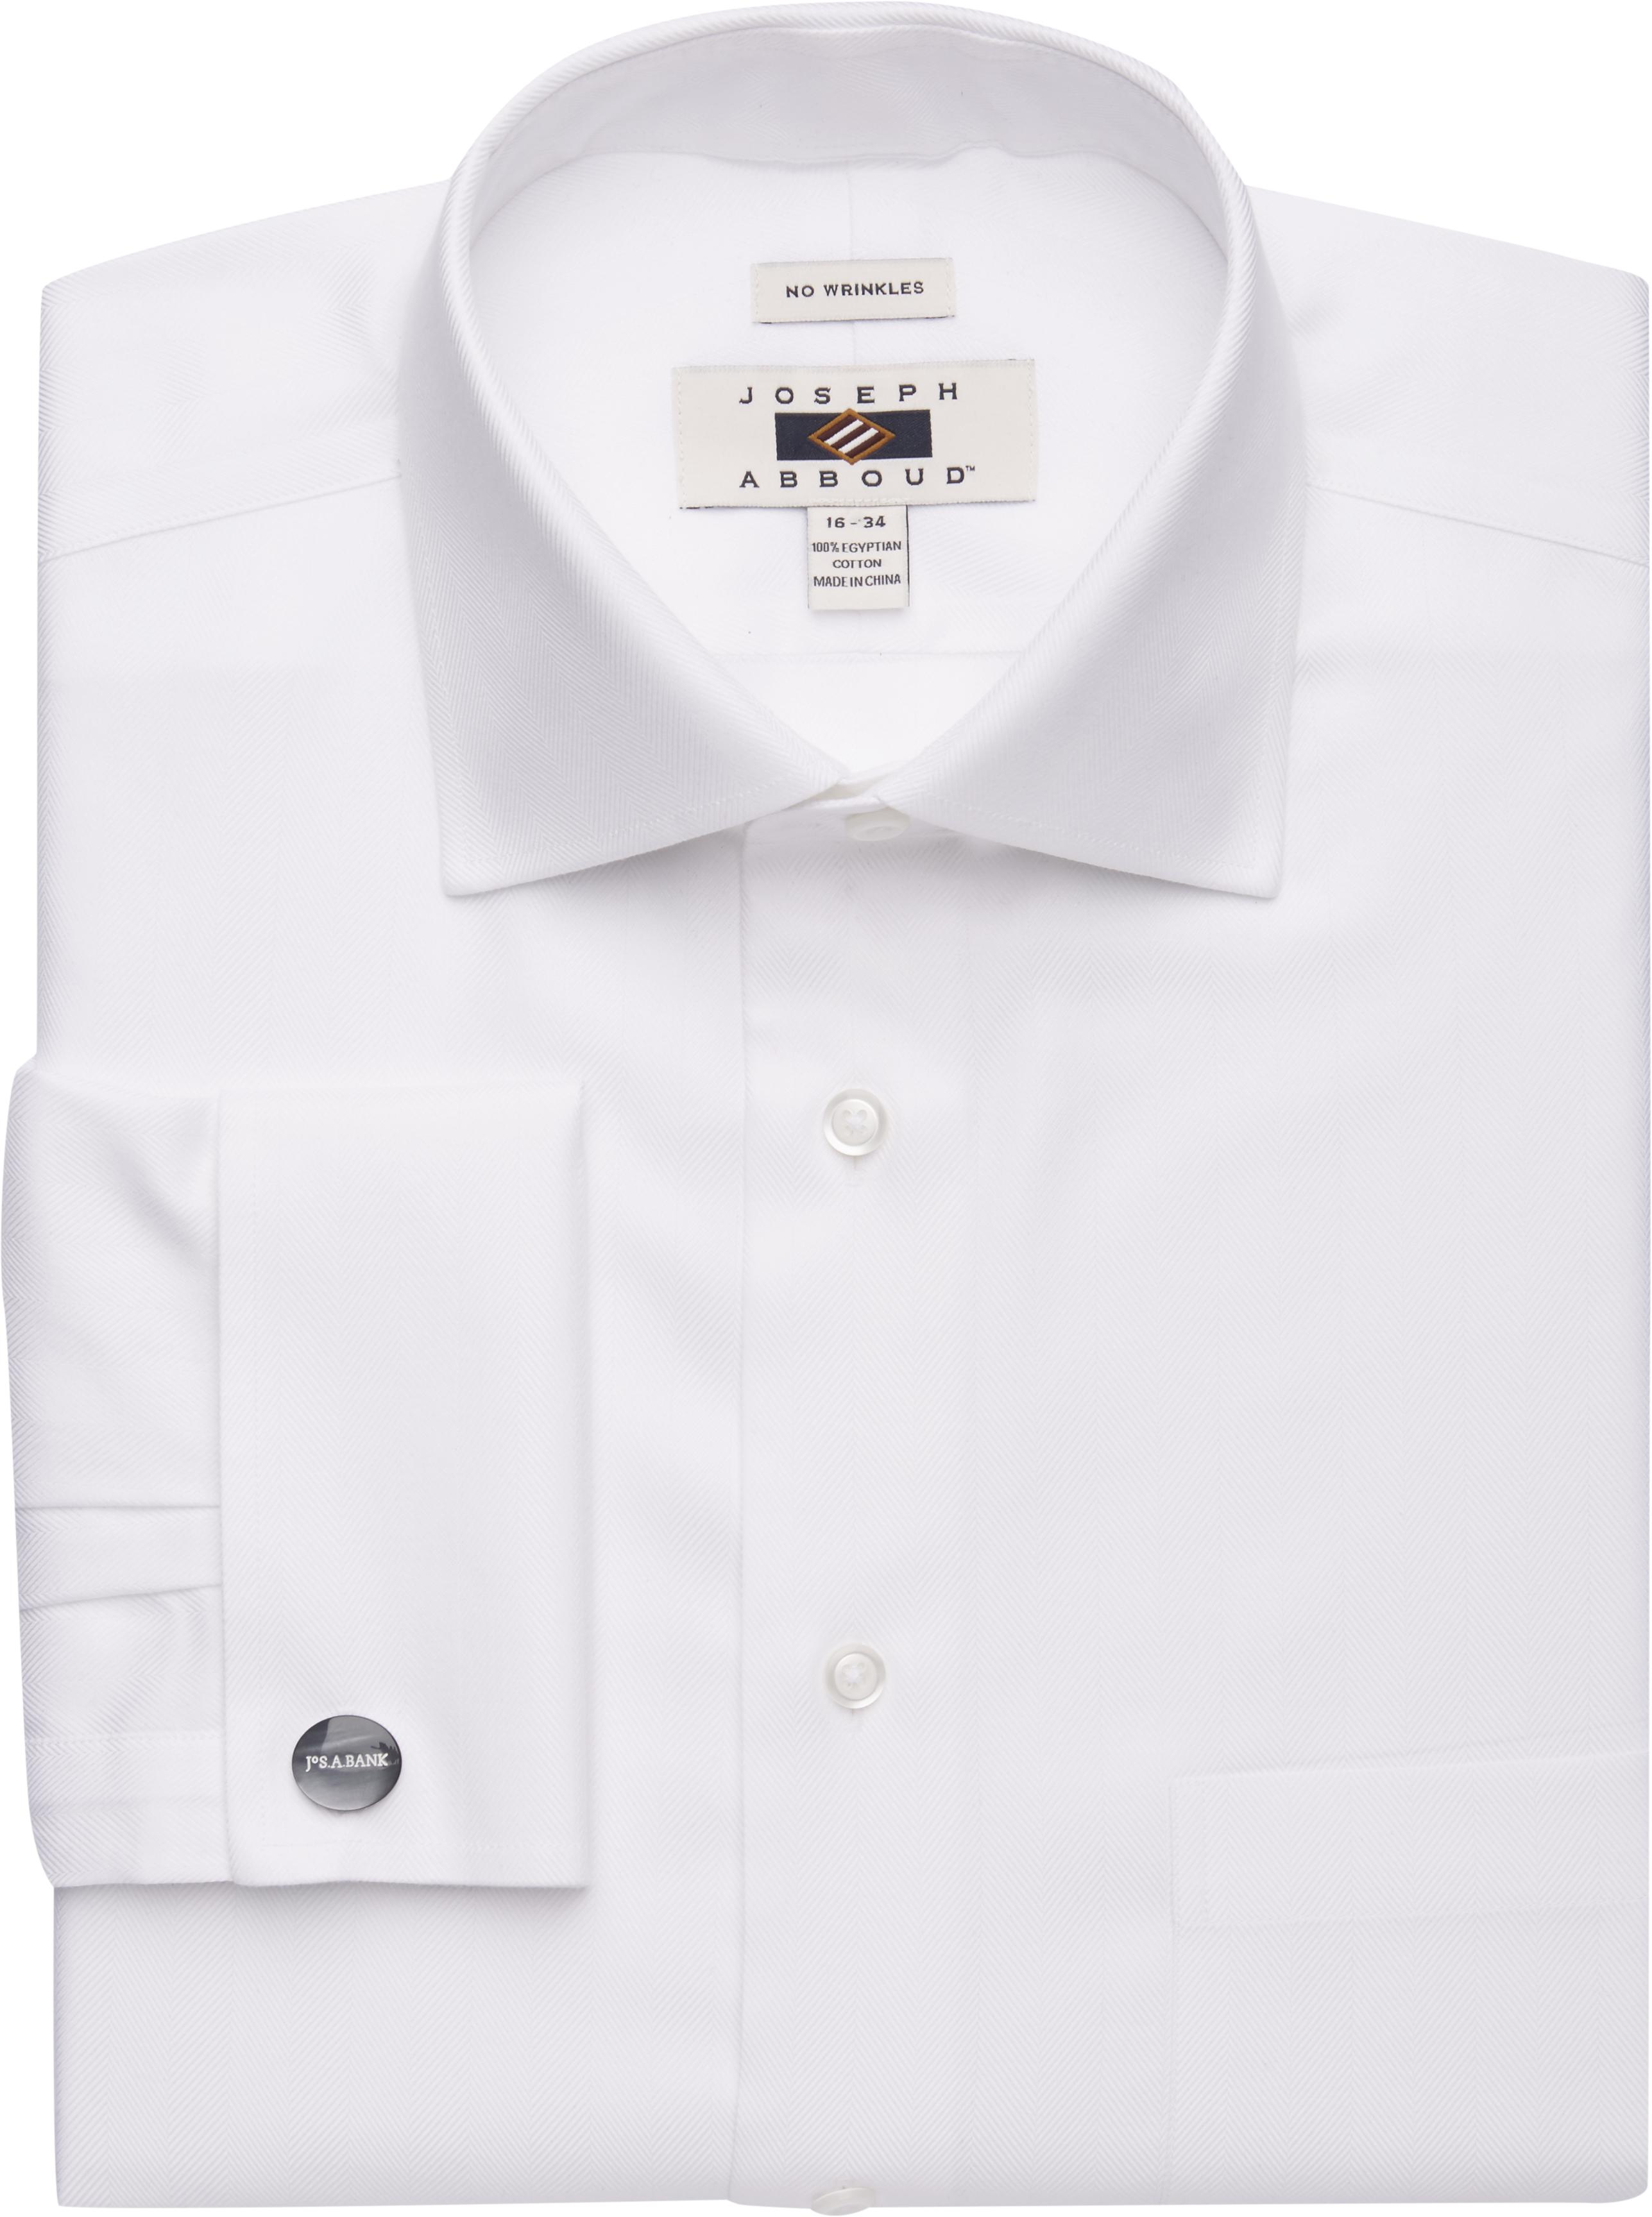 ad93a61e Joseph Abboud Traditional Fit Spread Collar Herringbone Dress Shirt  CLEARANCE #50X5